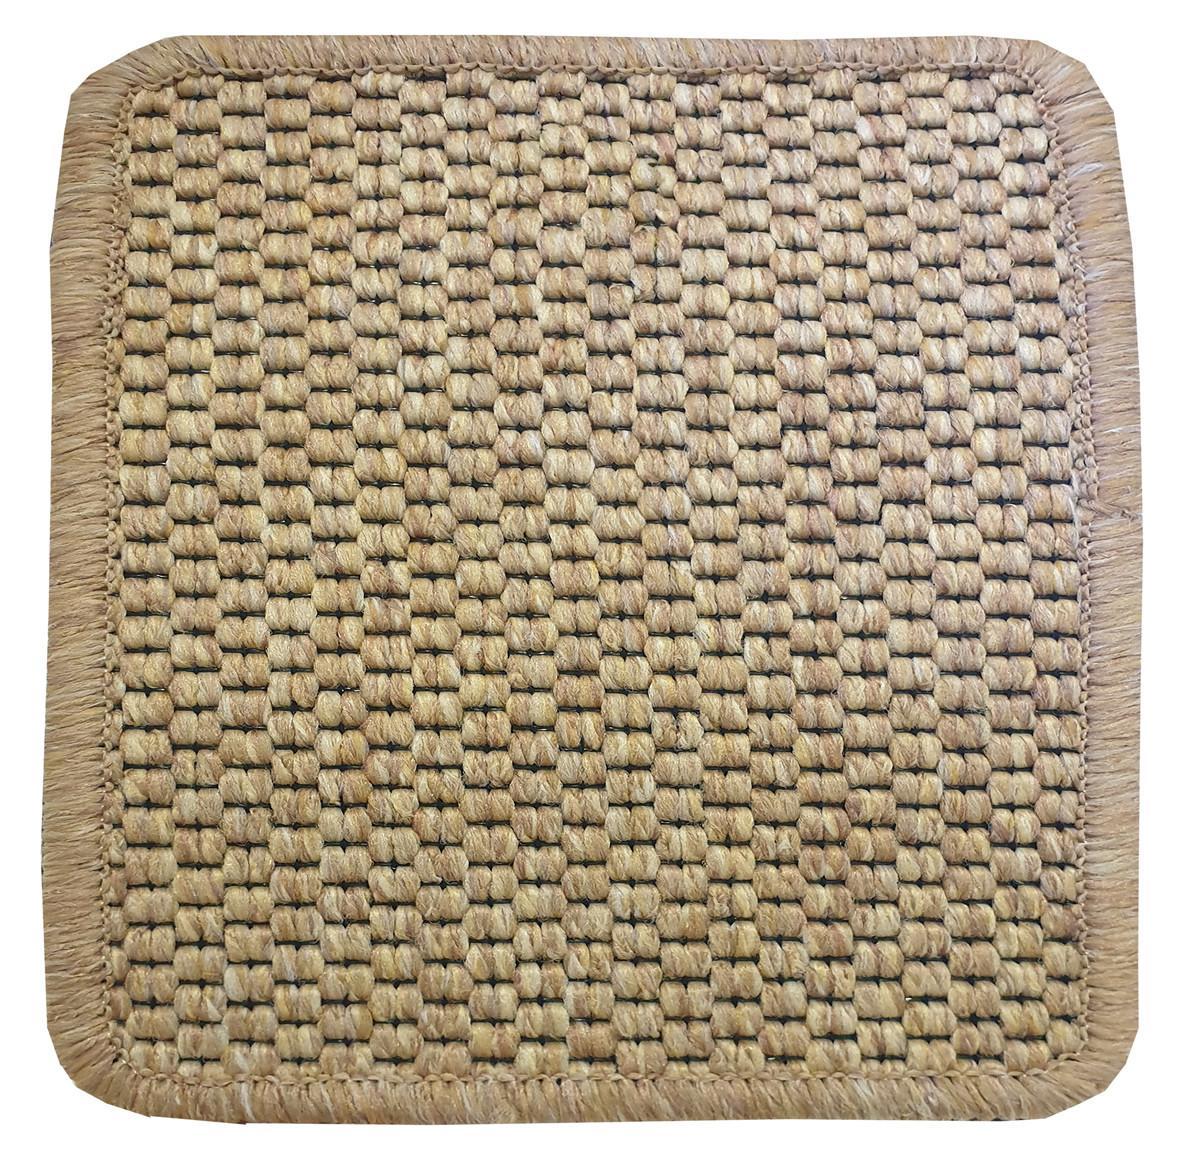 Vopi koberce Kusový koberec Nature terra čtverec - 200x200 cm